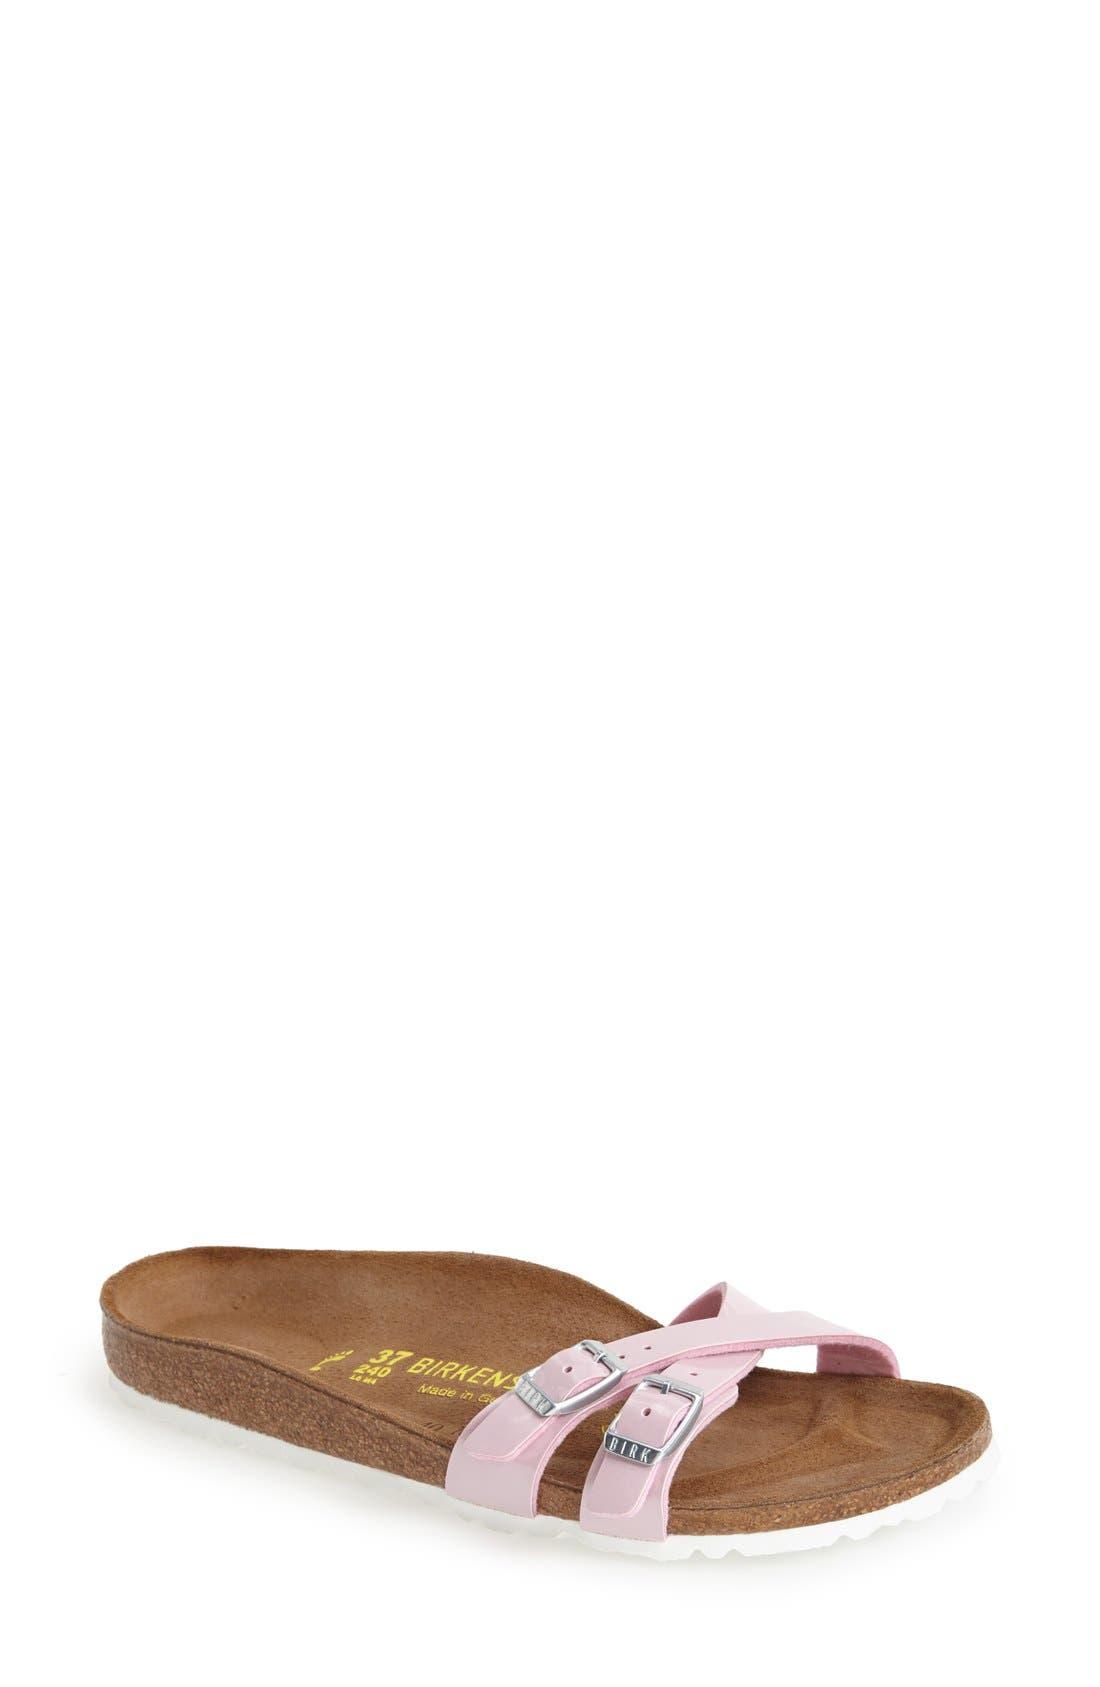 Main Image - Birkenstock 'Almere' Slide Sandal (Women)